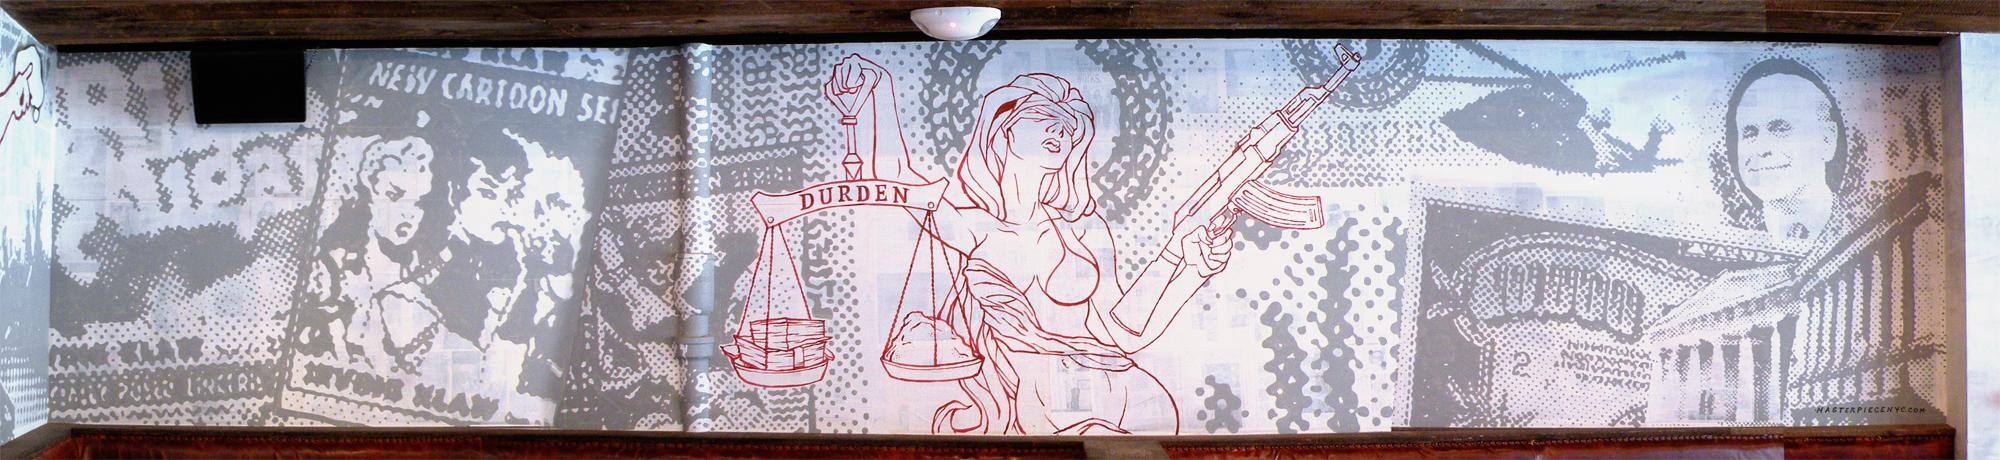 Bar mural, graffiti mural, street art mural, graffiti, street art, custom mural, hire a graffiti artist